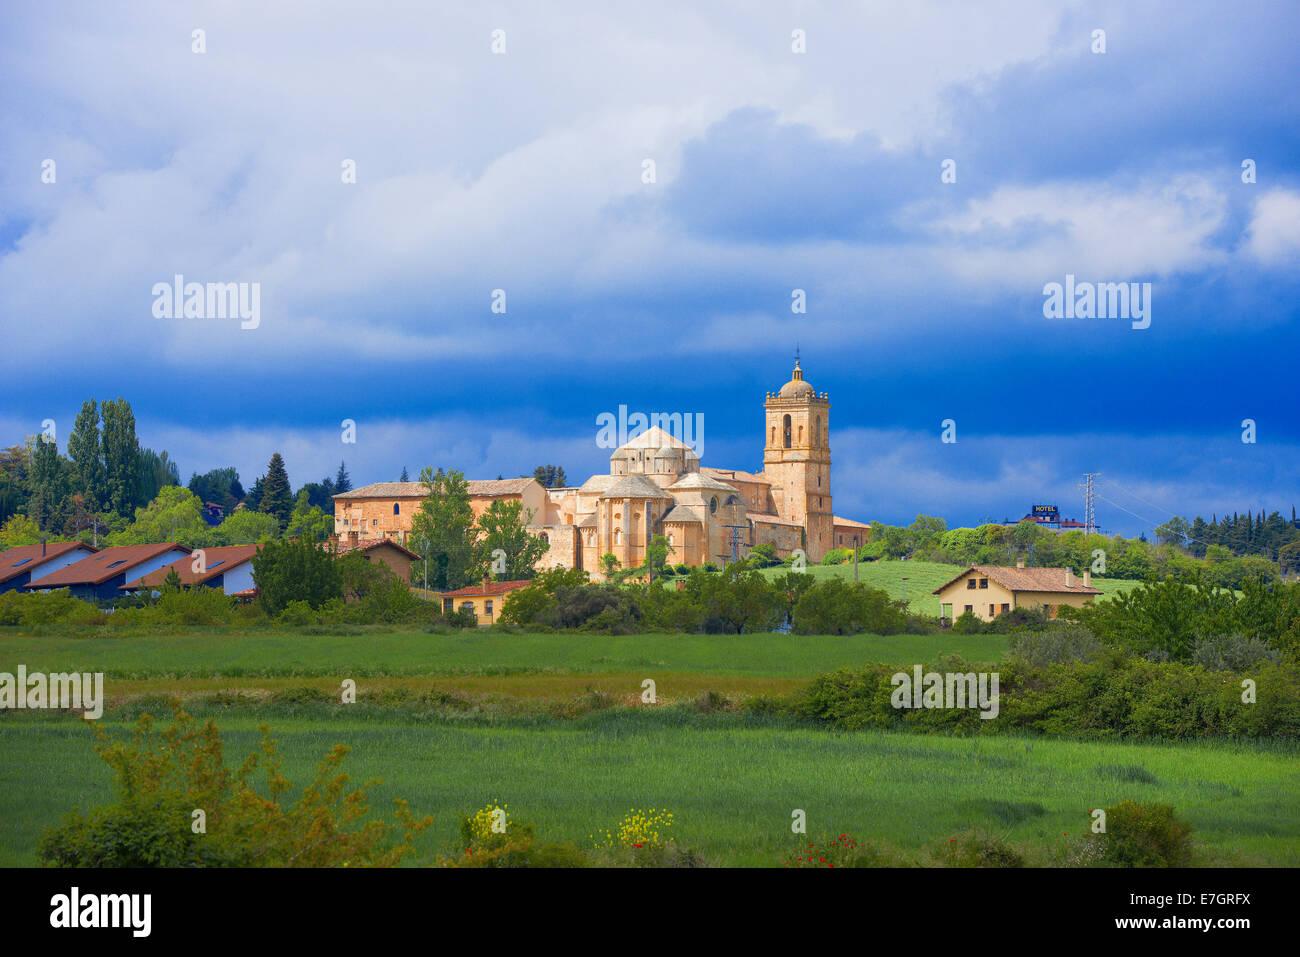 Irache Monastery, Camino de Santiago, Navarra, Ayegui, Navarre, Way of St James, Spain - Stock Image